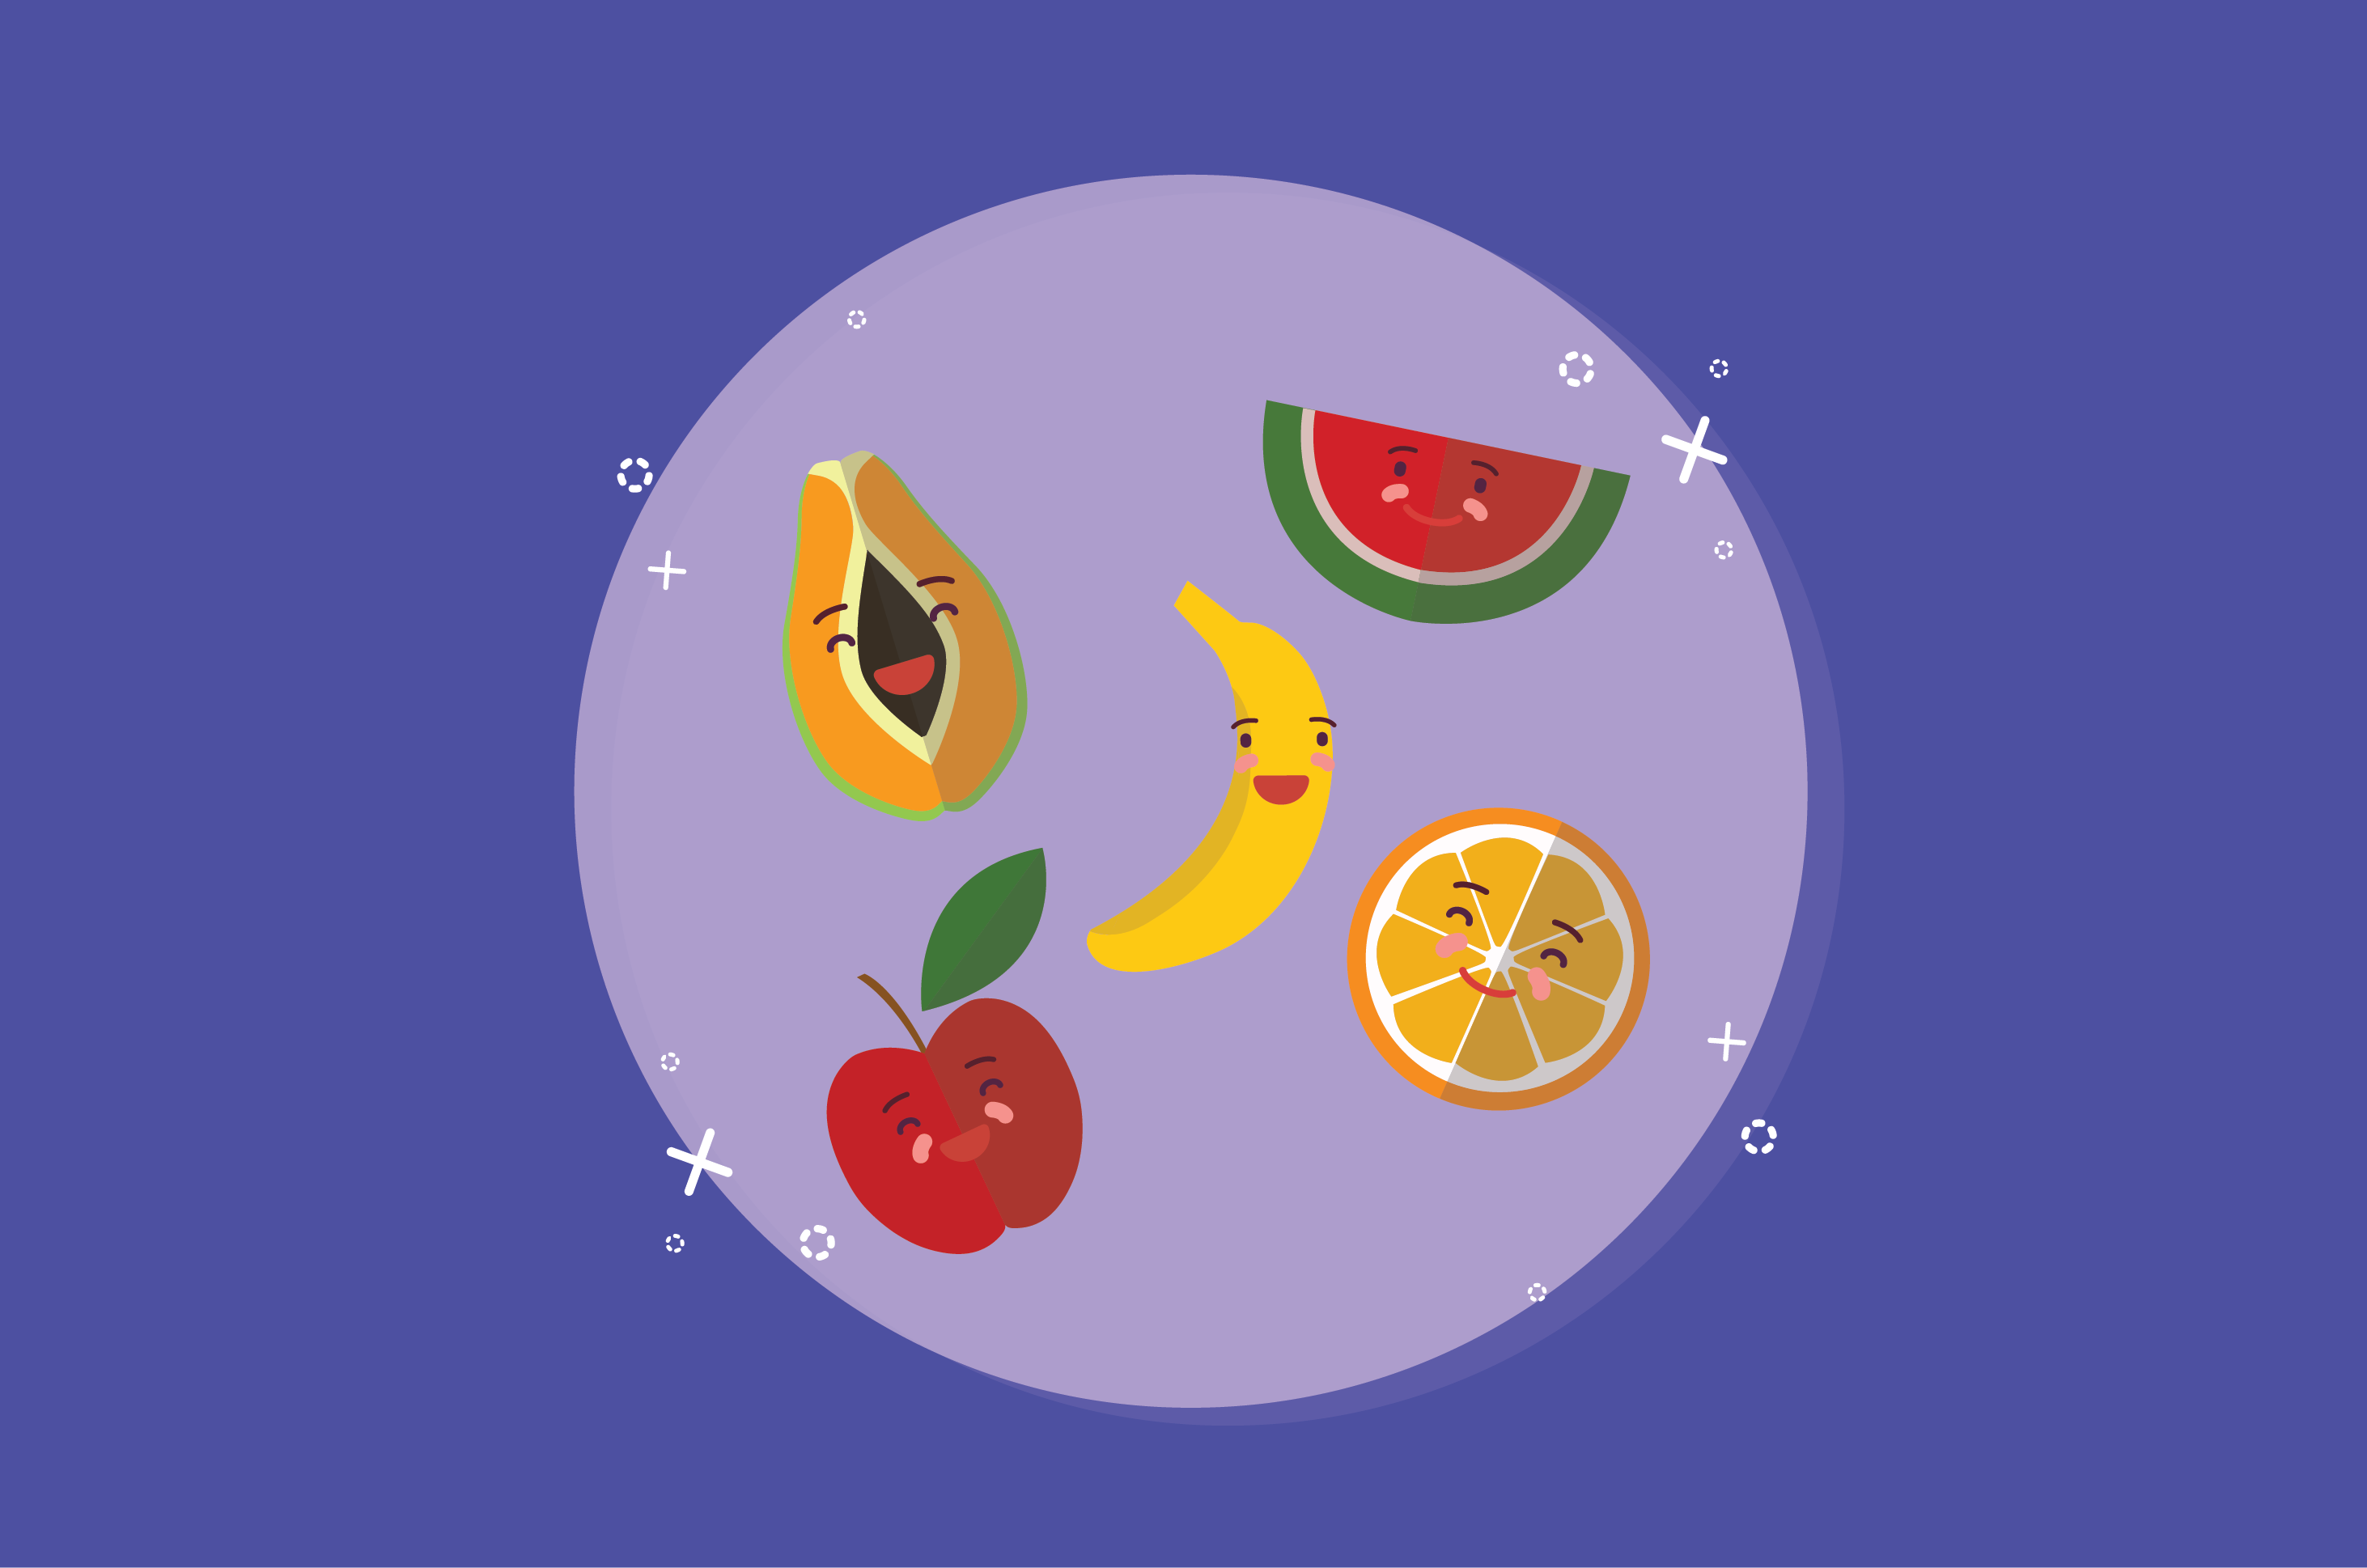 buah untuk melancarkan pencernaan, buah melancarkan buang air besar, melancarkan BAB, konstipasi